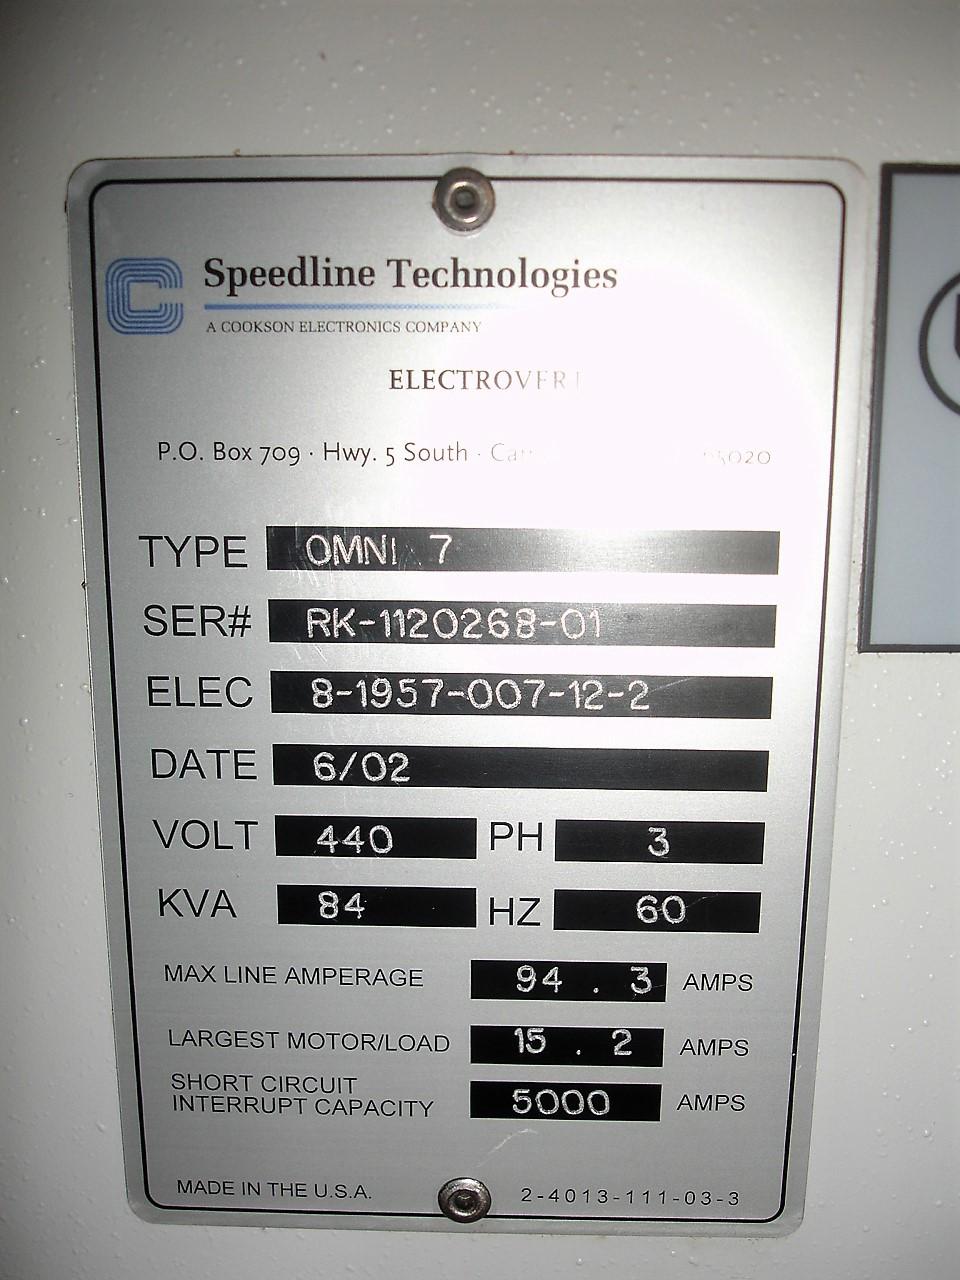 Speedline - Electrovert Omni 7 Reflow Oven2